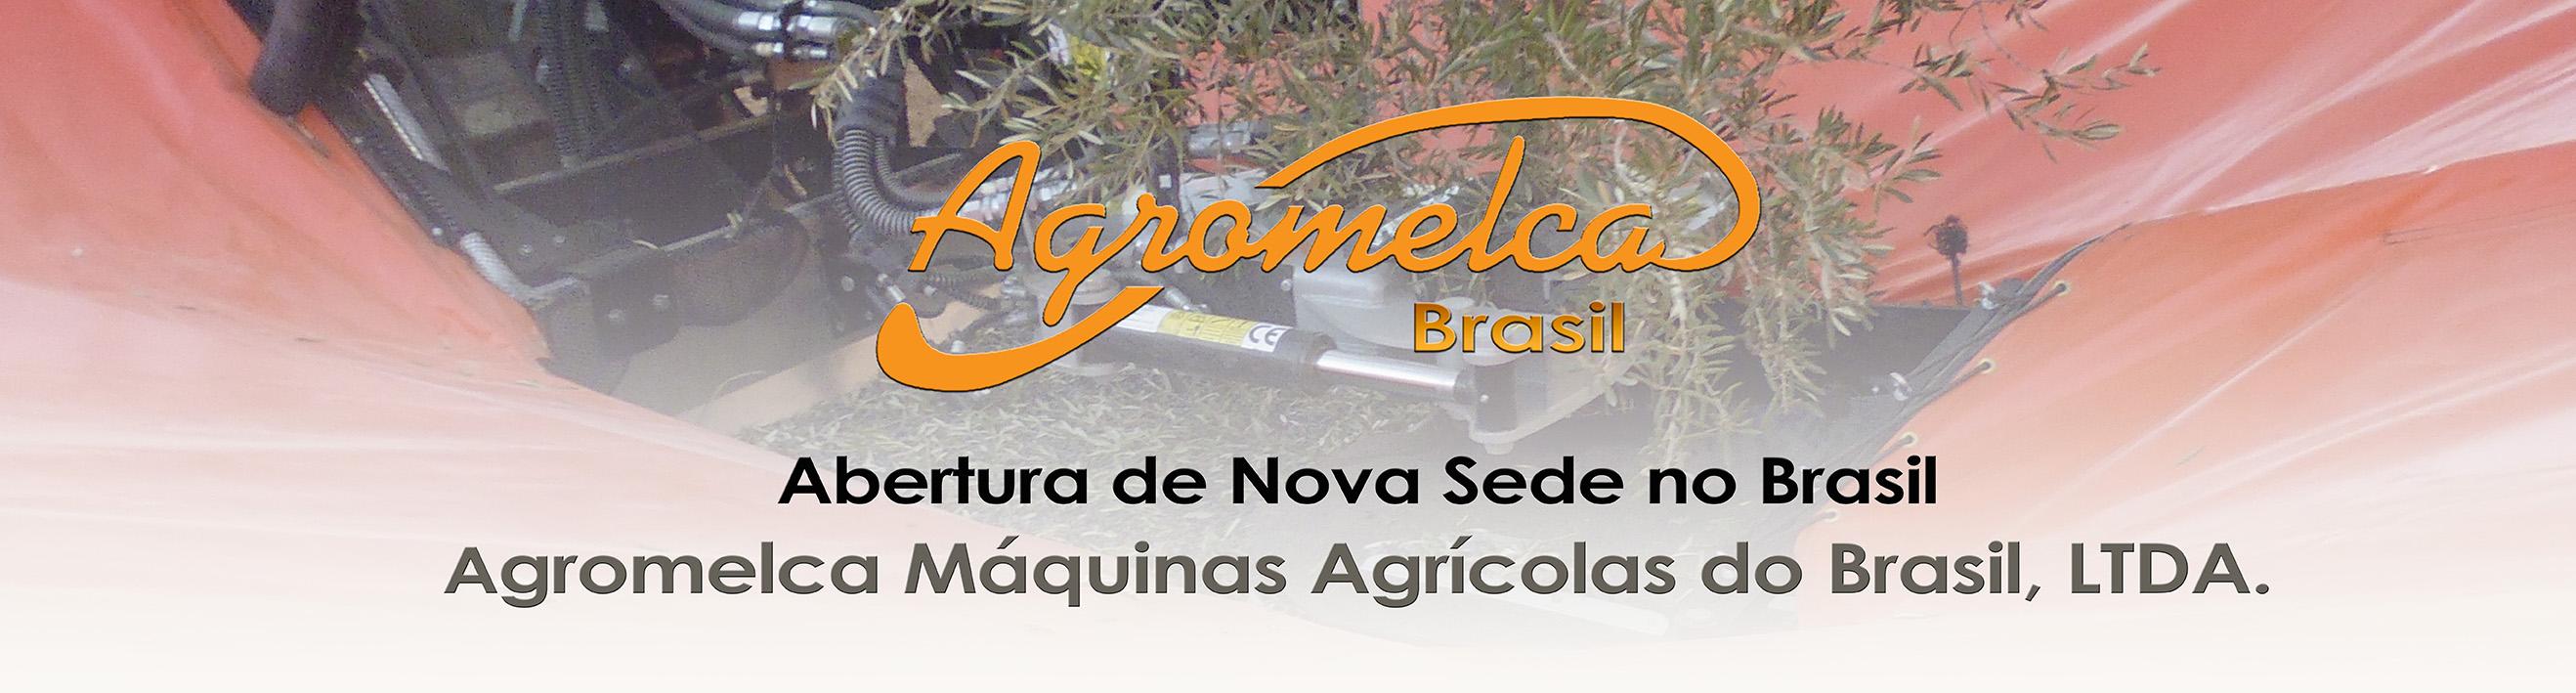 equipos_recolectores_de_aceituna_y_frutos_secos_agromelca_en_brasil_portugues-banner